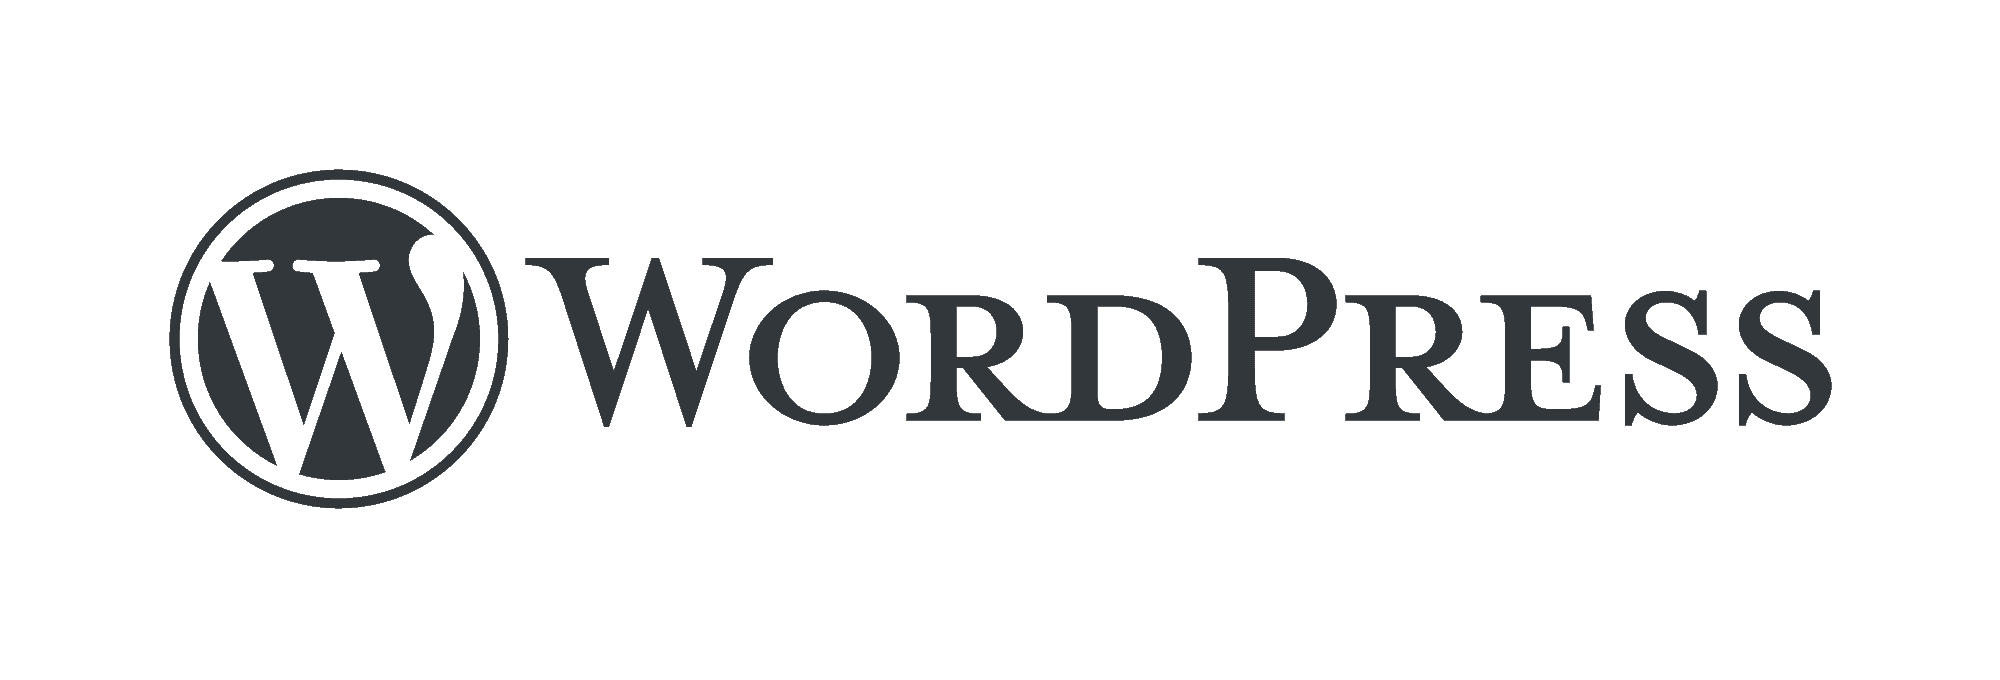 Blogger vs WordPress : Which is the Best Blogging Platform to Start a Blog